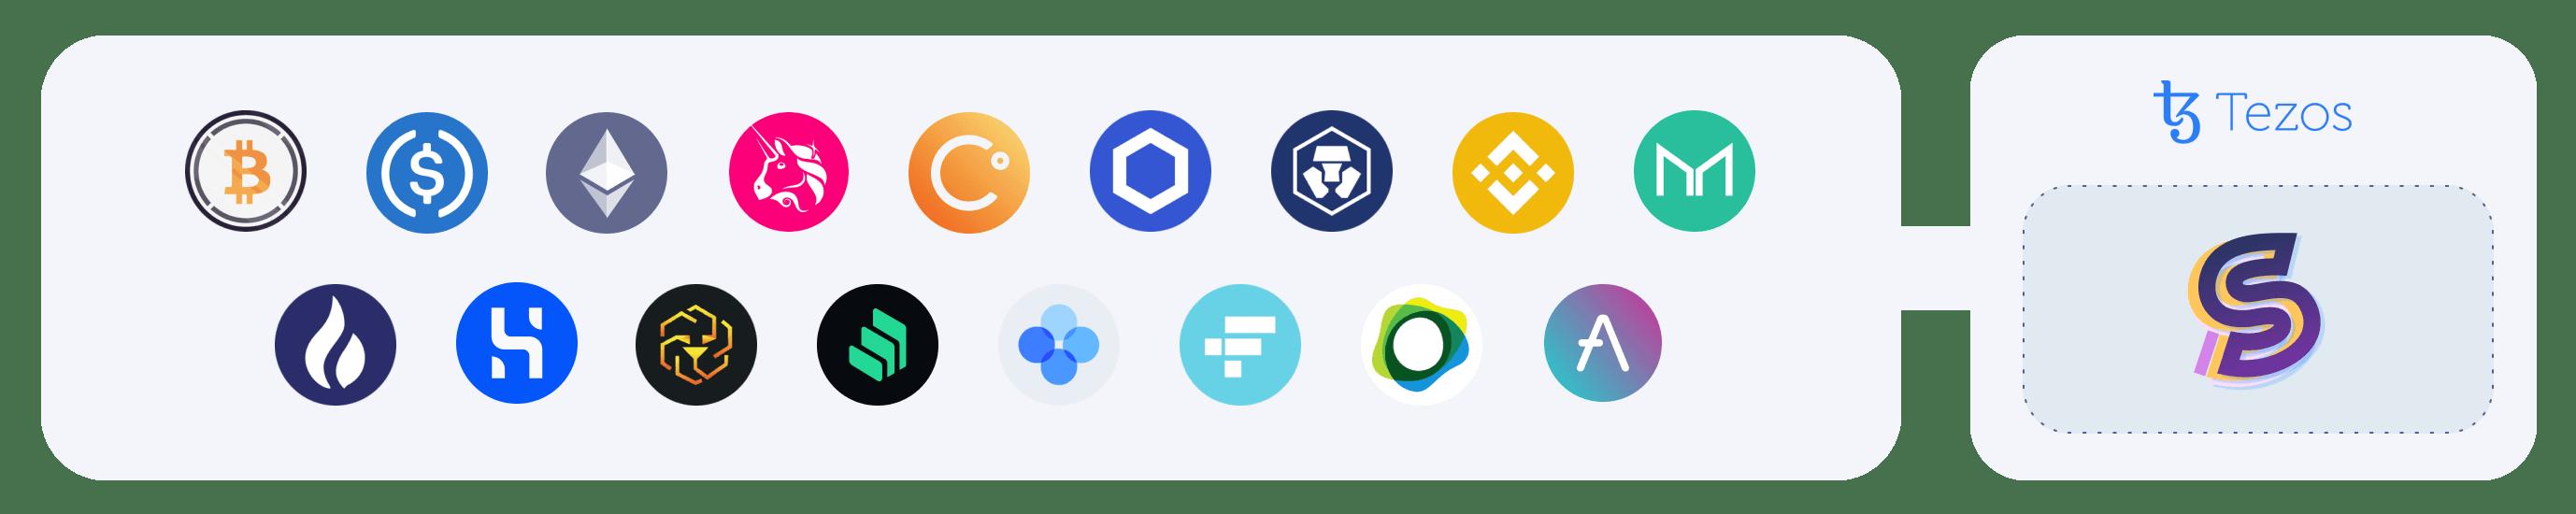 Smartlink Tezos FA 1.2 Wrapped tokens